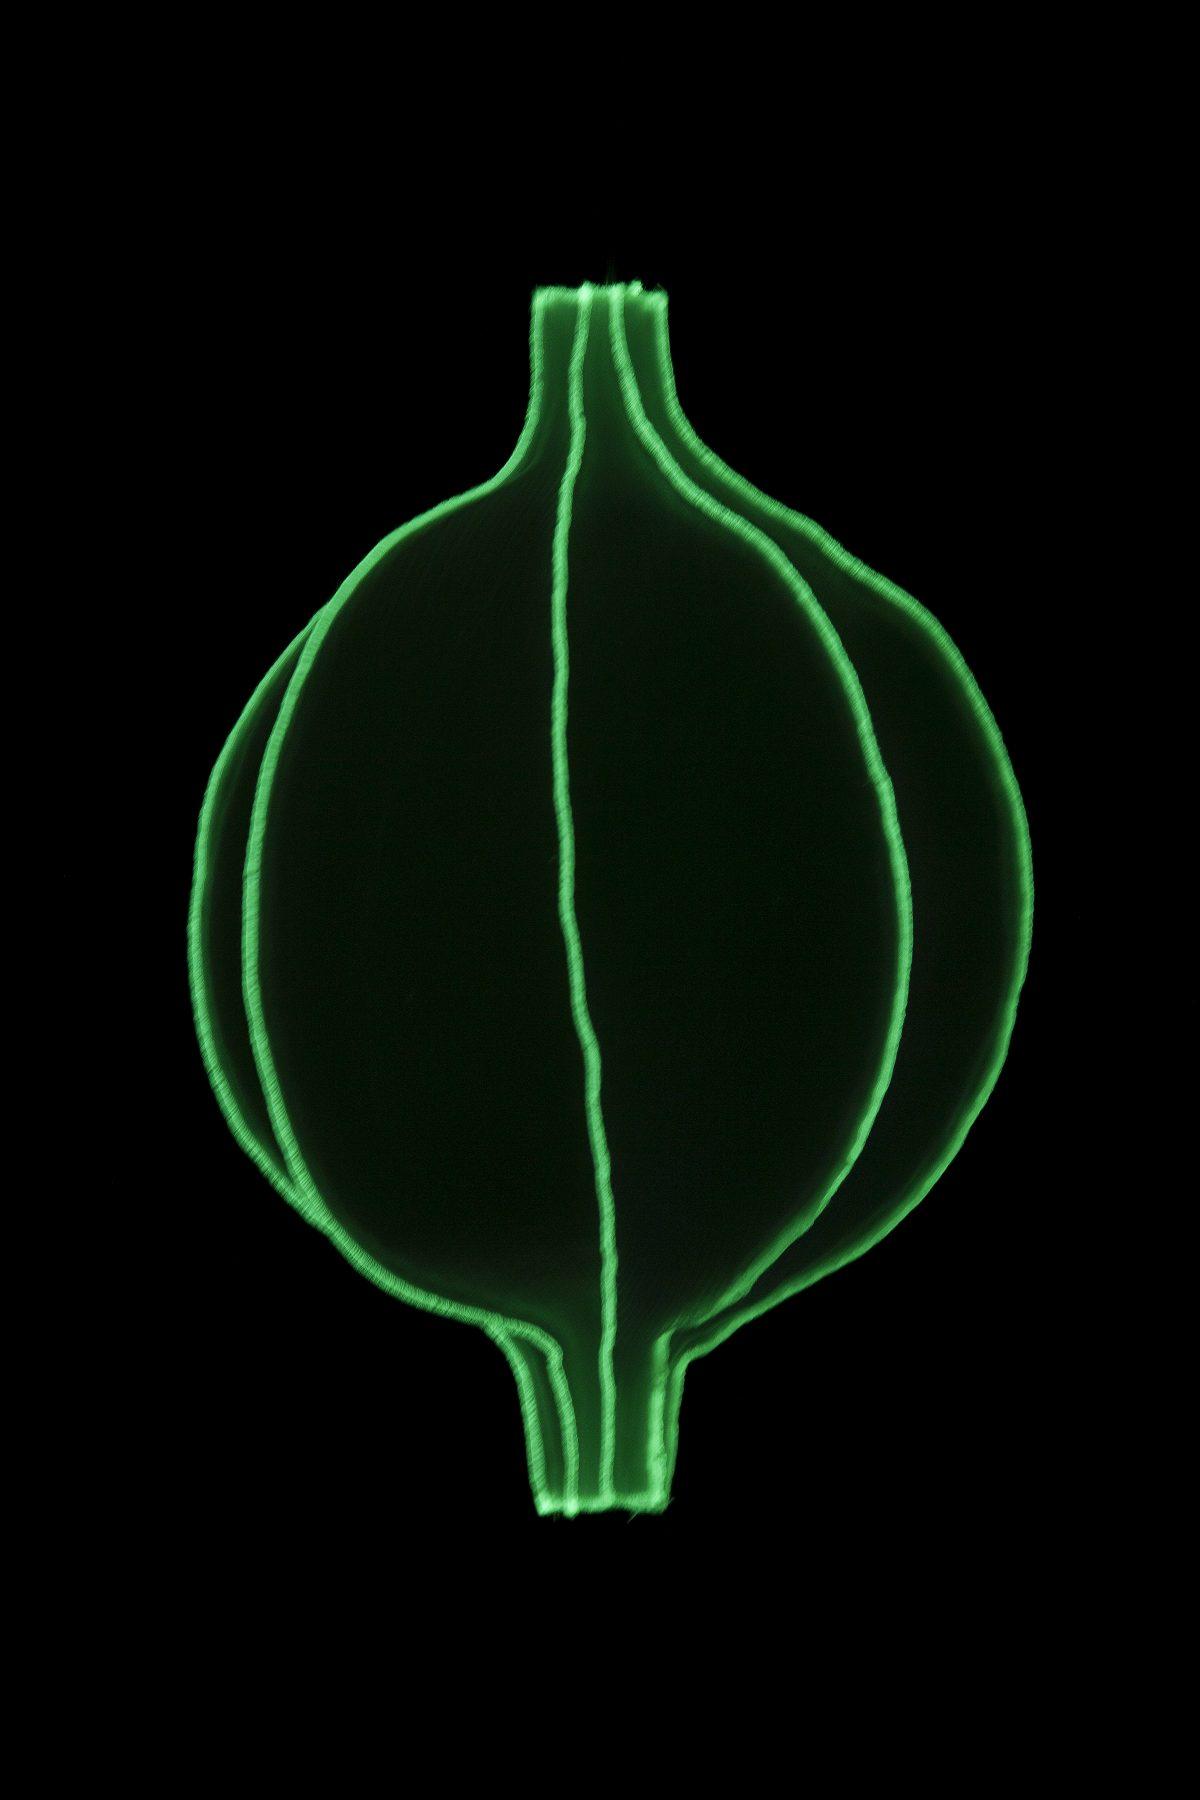 Radiolaria Discomedusa Infans glow-in-the-dark hanglamp van Bernotat